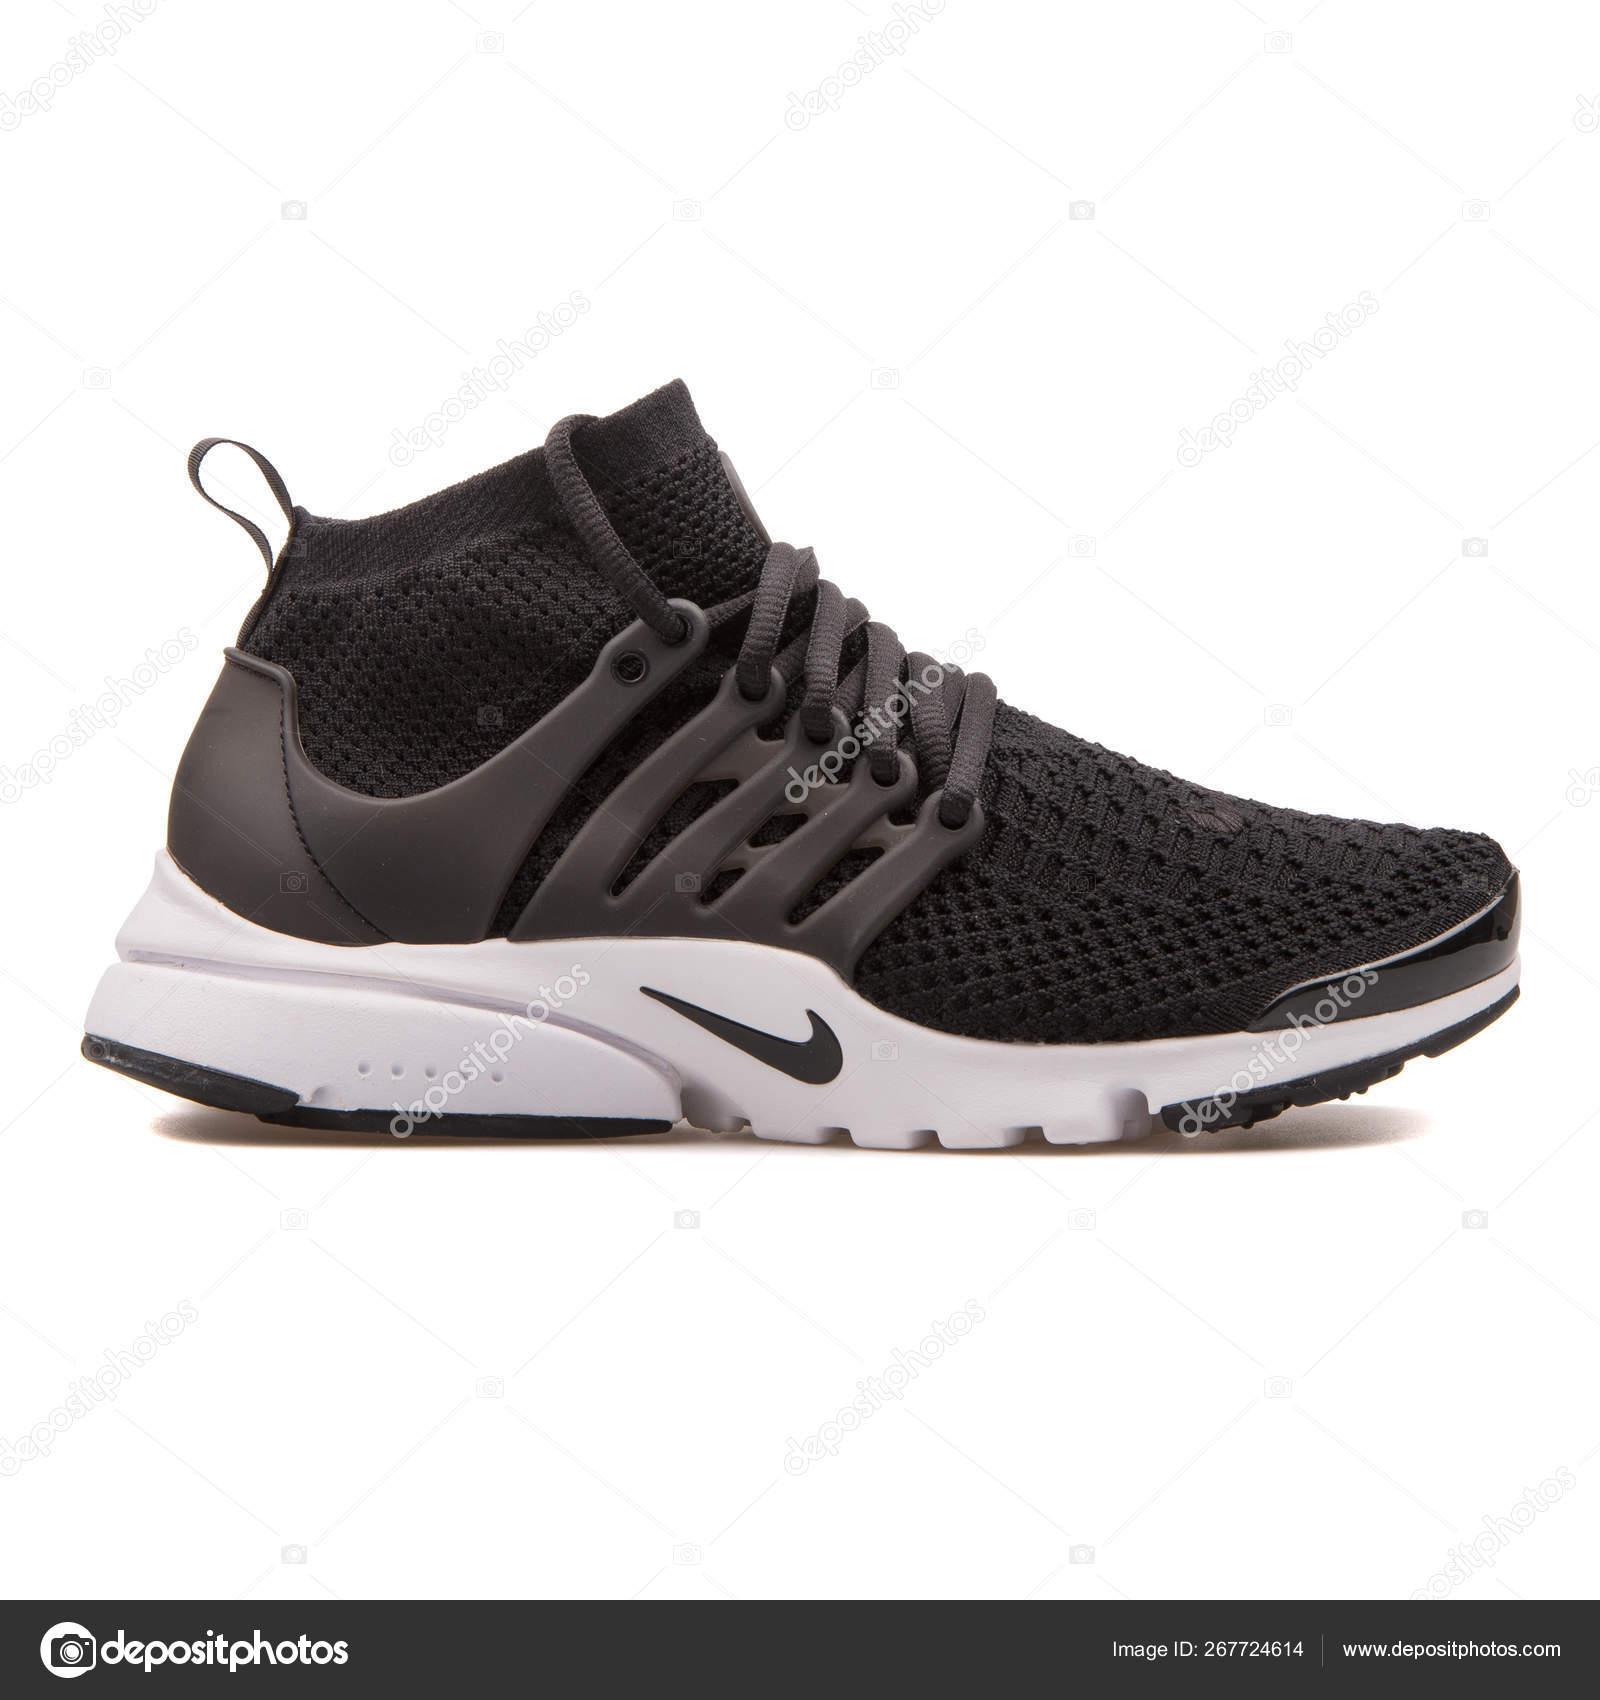 Nike Air Presto Flyknit Ultra black and white sneaker 267724614